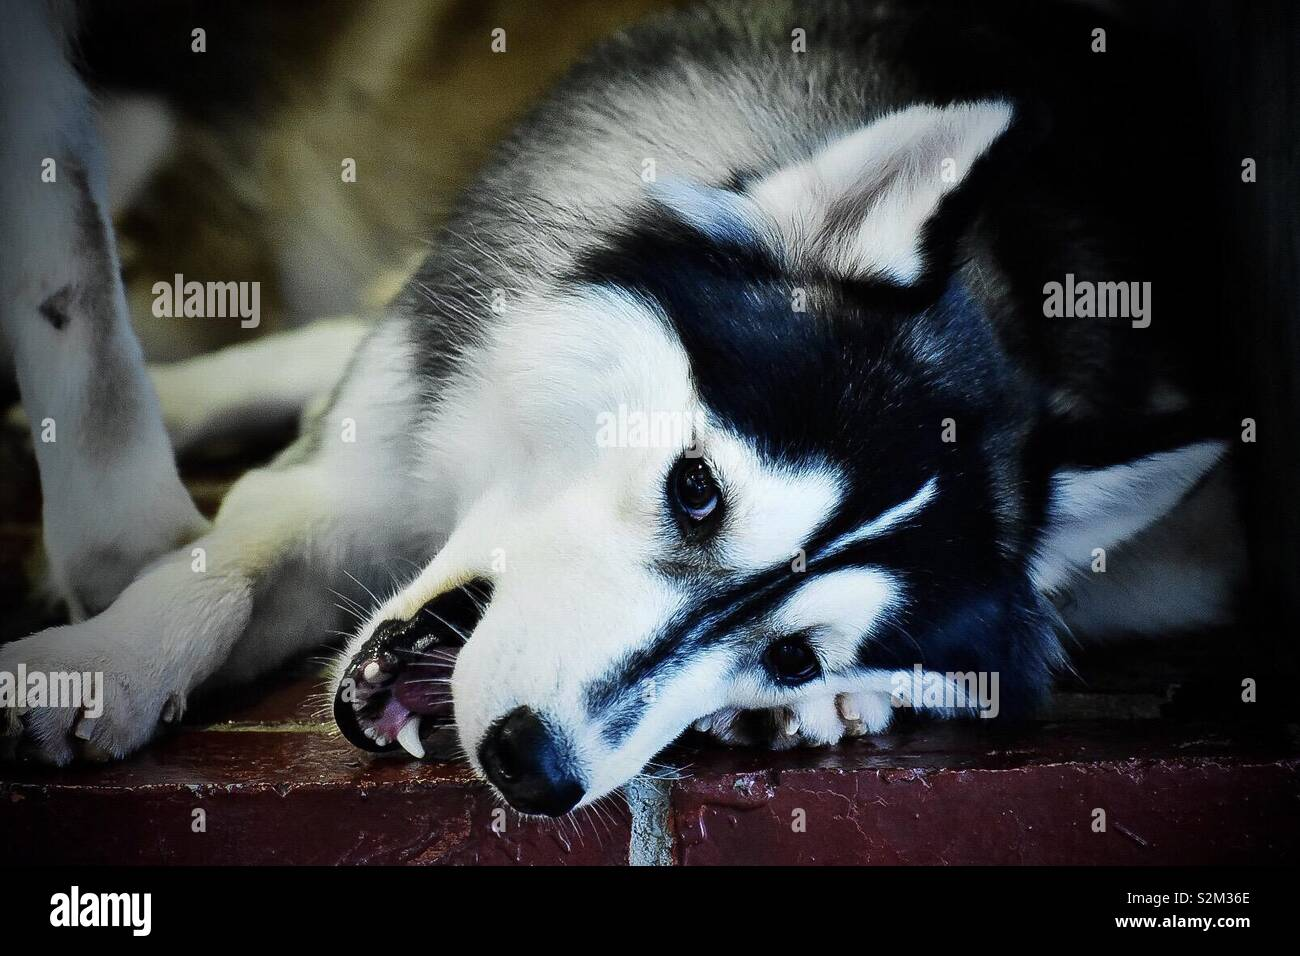 Cute smiling husky. - Stock Image